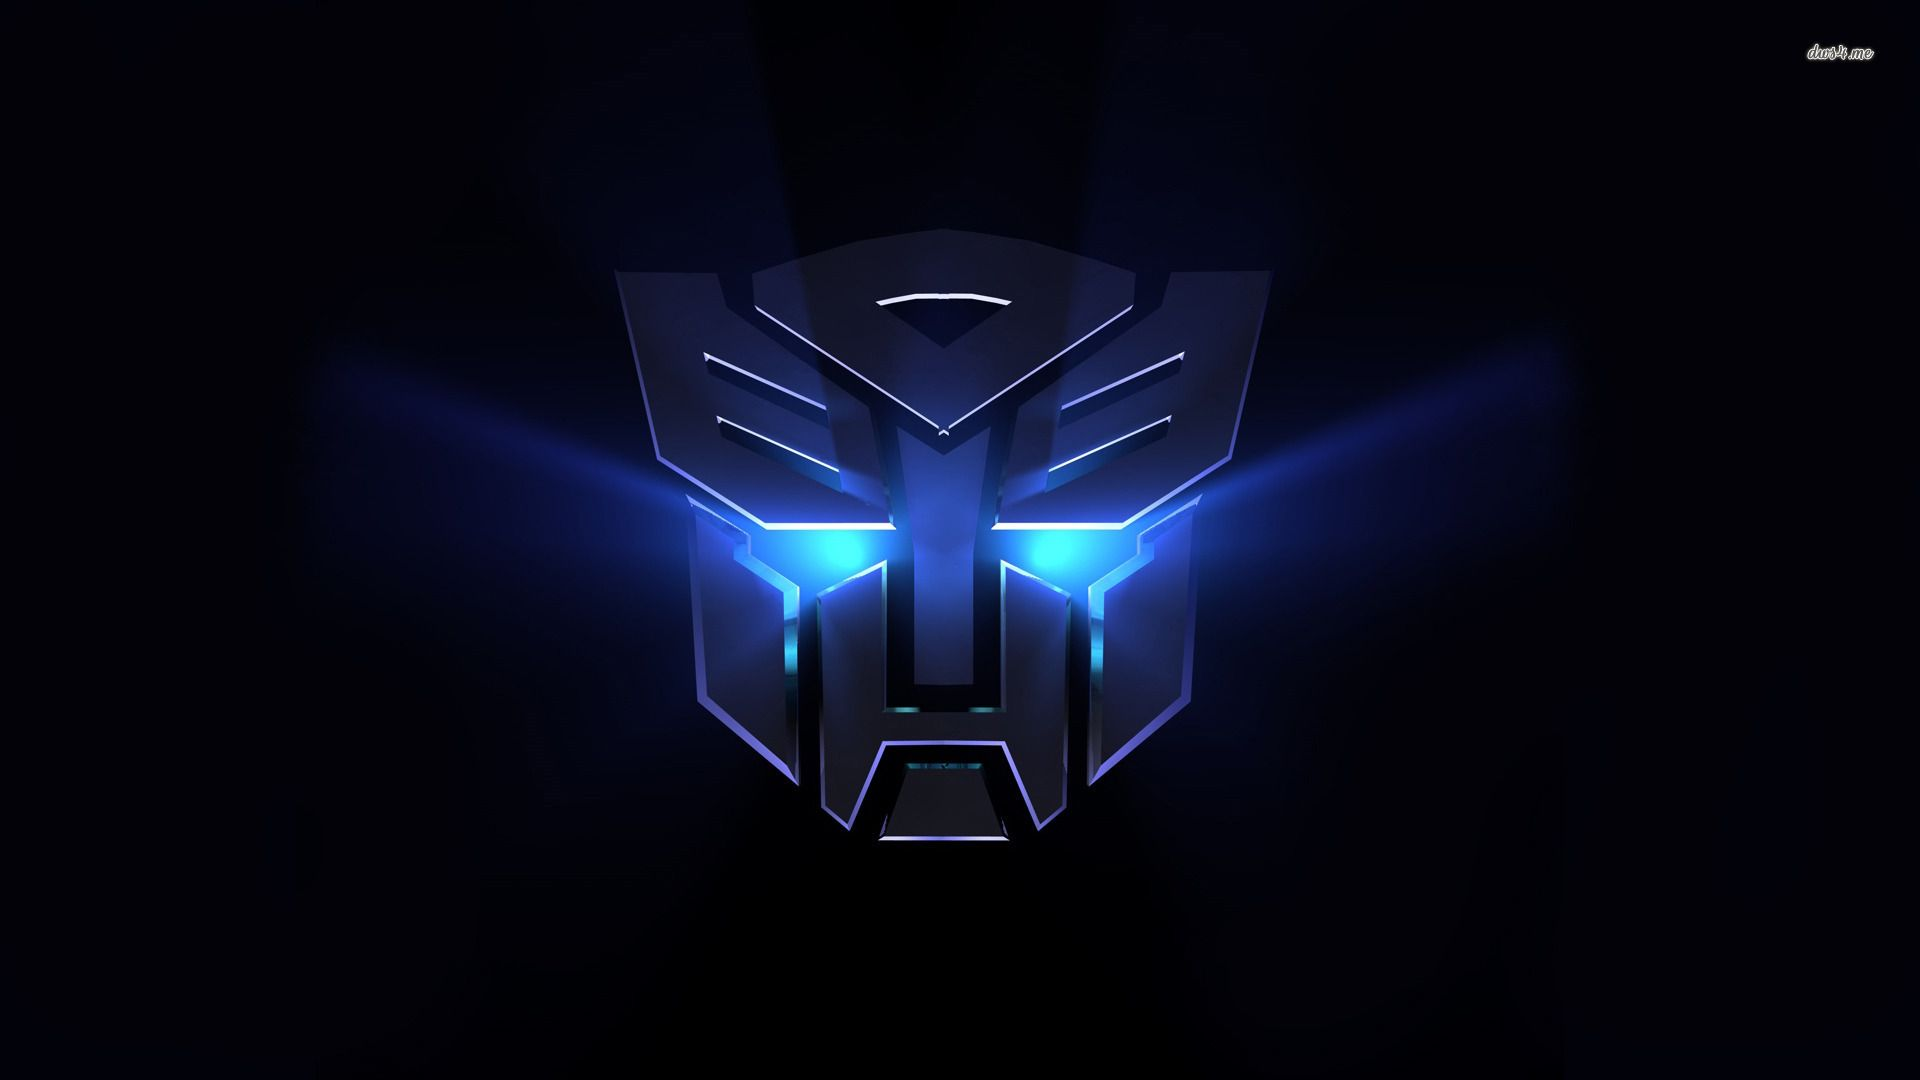 Autobots Transformers Blue Logo Transformer Logo Transformers Decepticons Autobots Logo